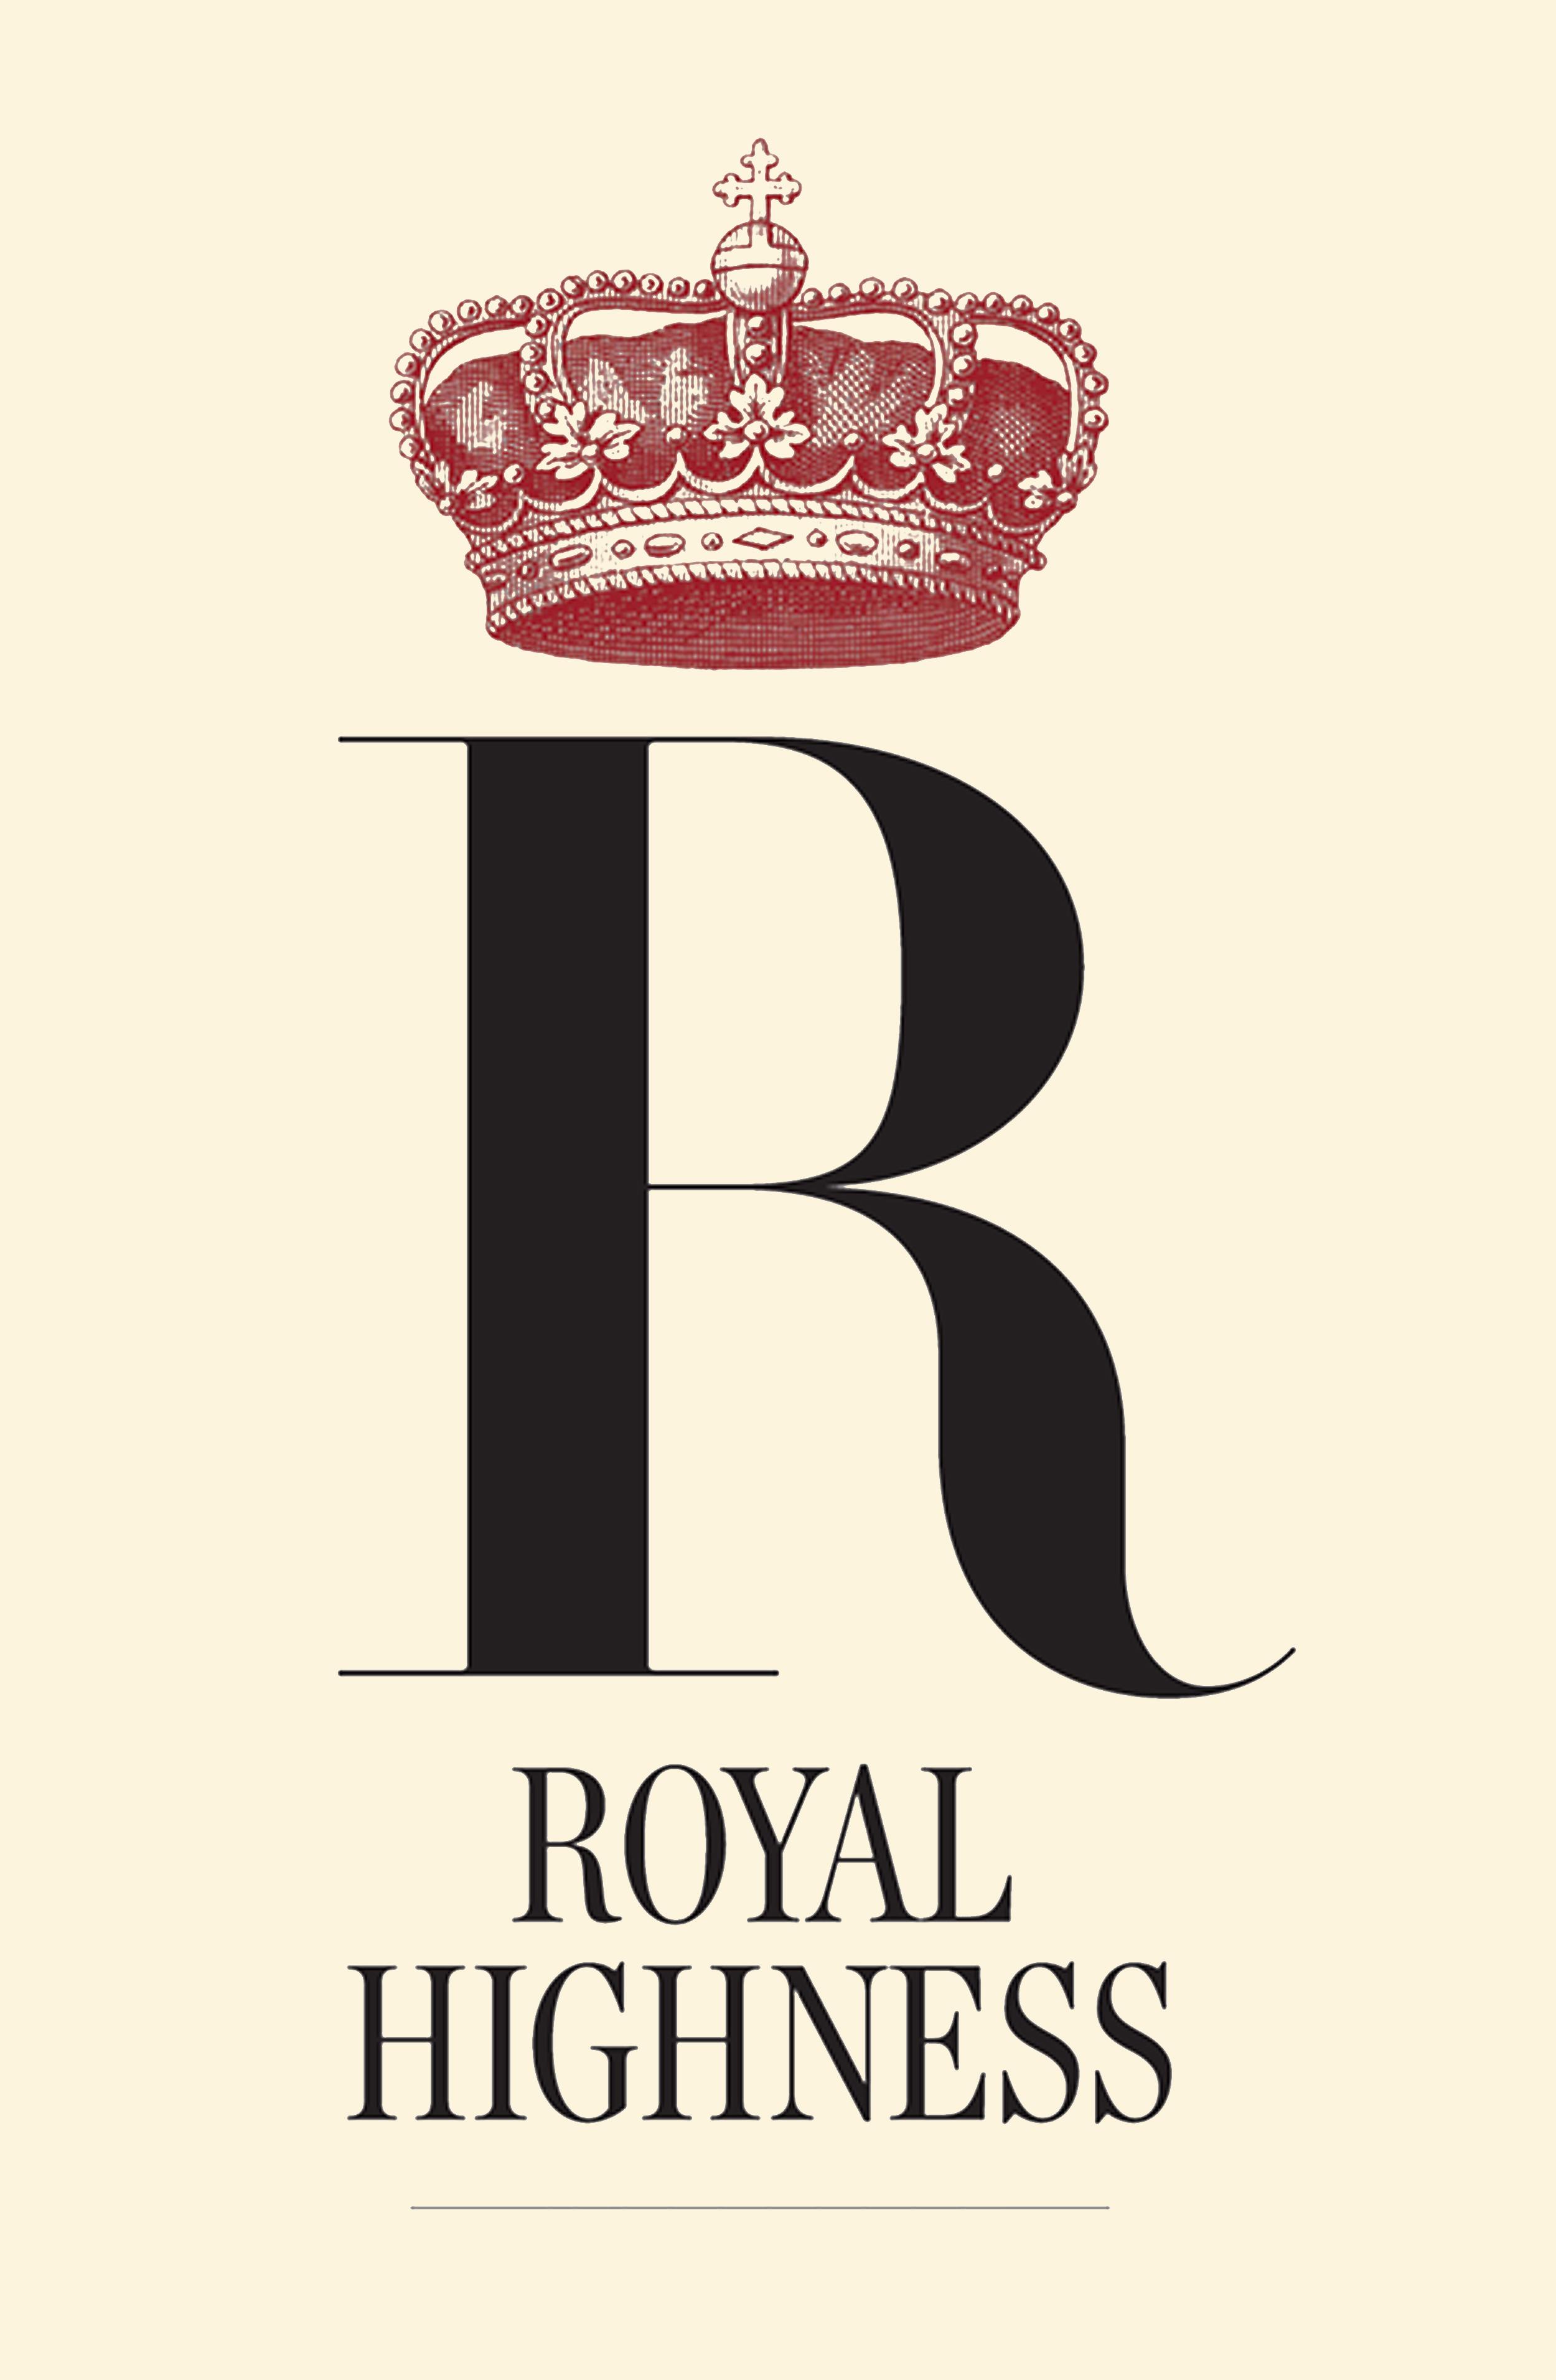 royal_highness_yellow.jpg